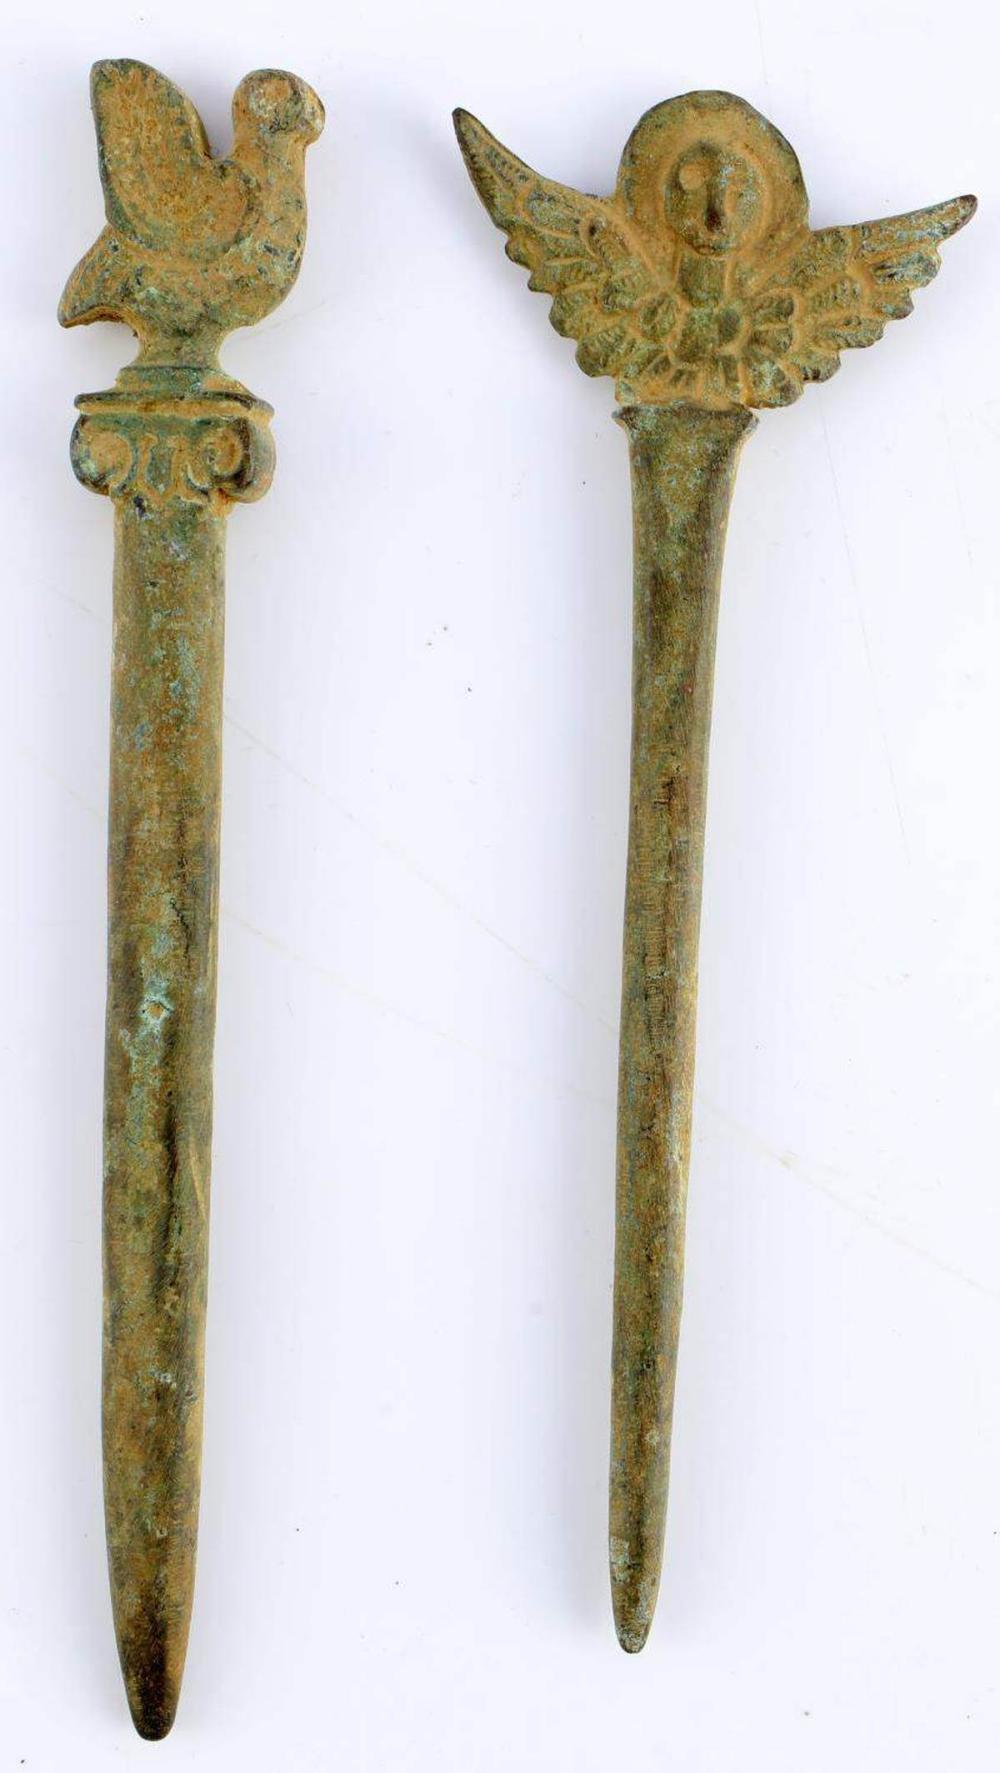 2 ANCIENT ROMAN BRONZE HAIR PIN OR STYLUS